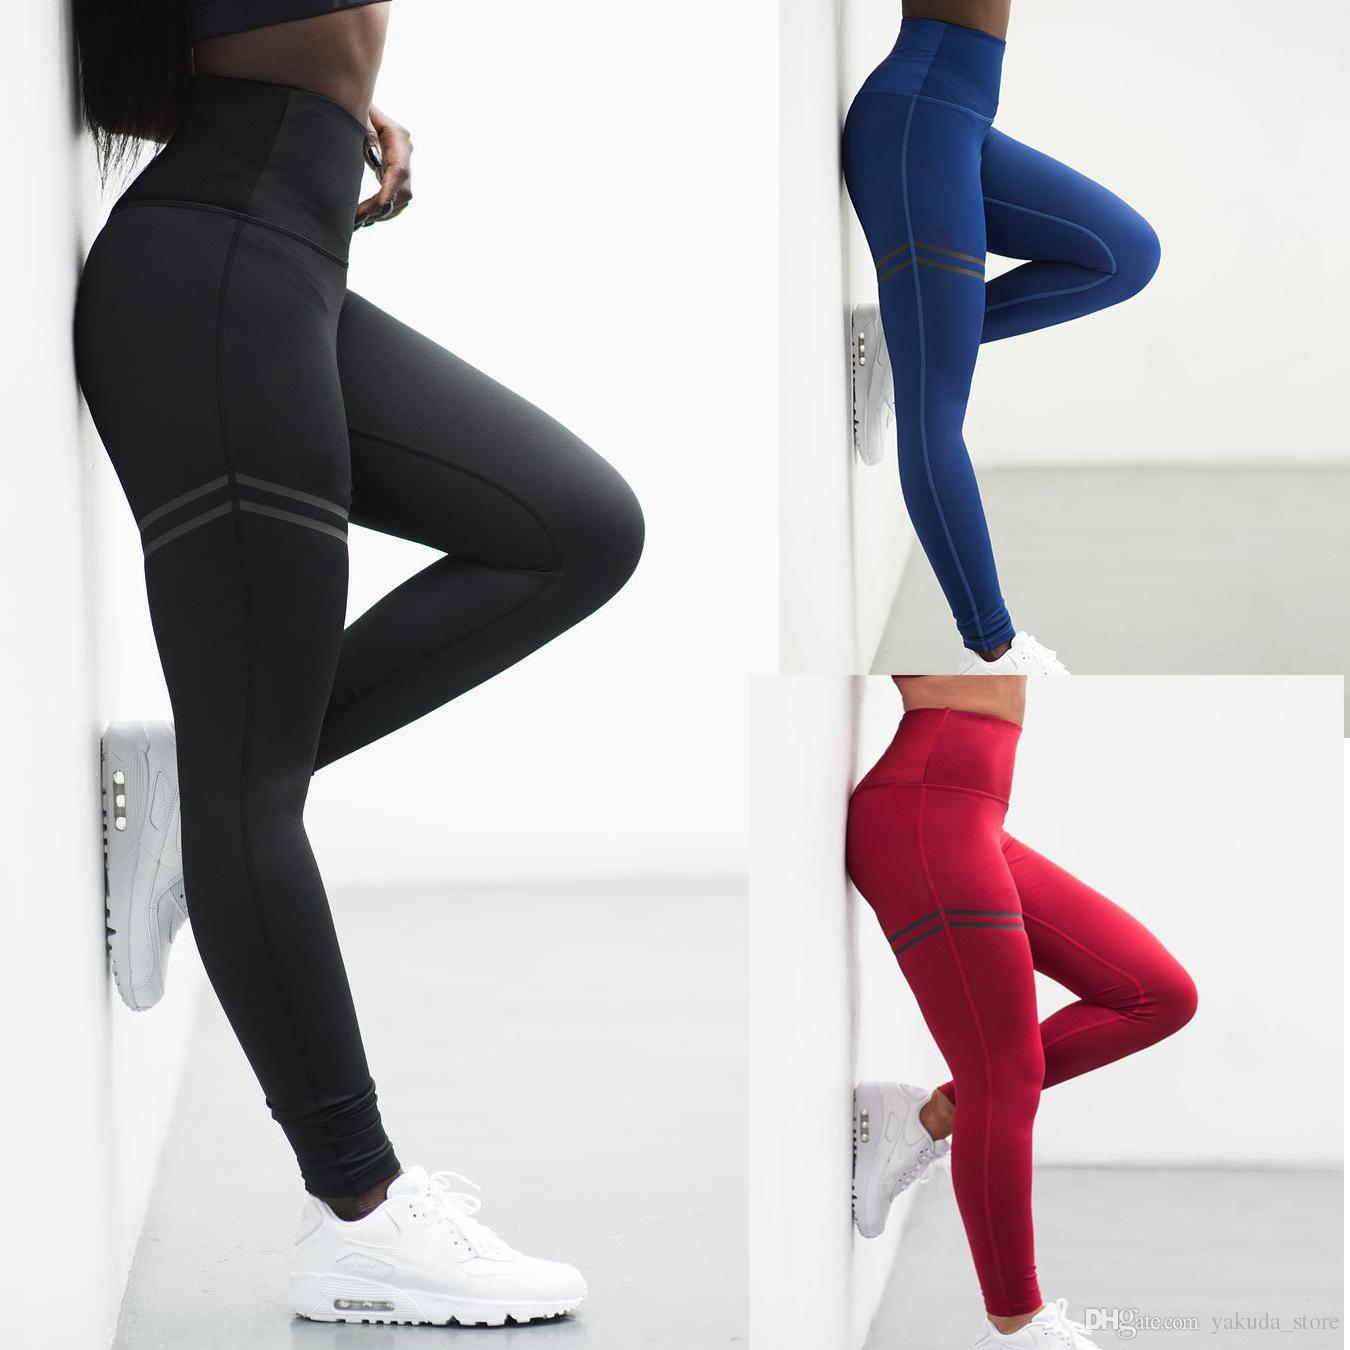 87781e210e080 Quick-drying Fitness Leggings Girl High Waist Pants Women's Fashion Push Up  Legging Polyester Sporting Activewear Bodybuilding Jeggings